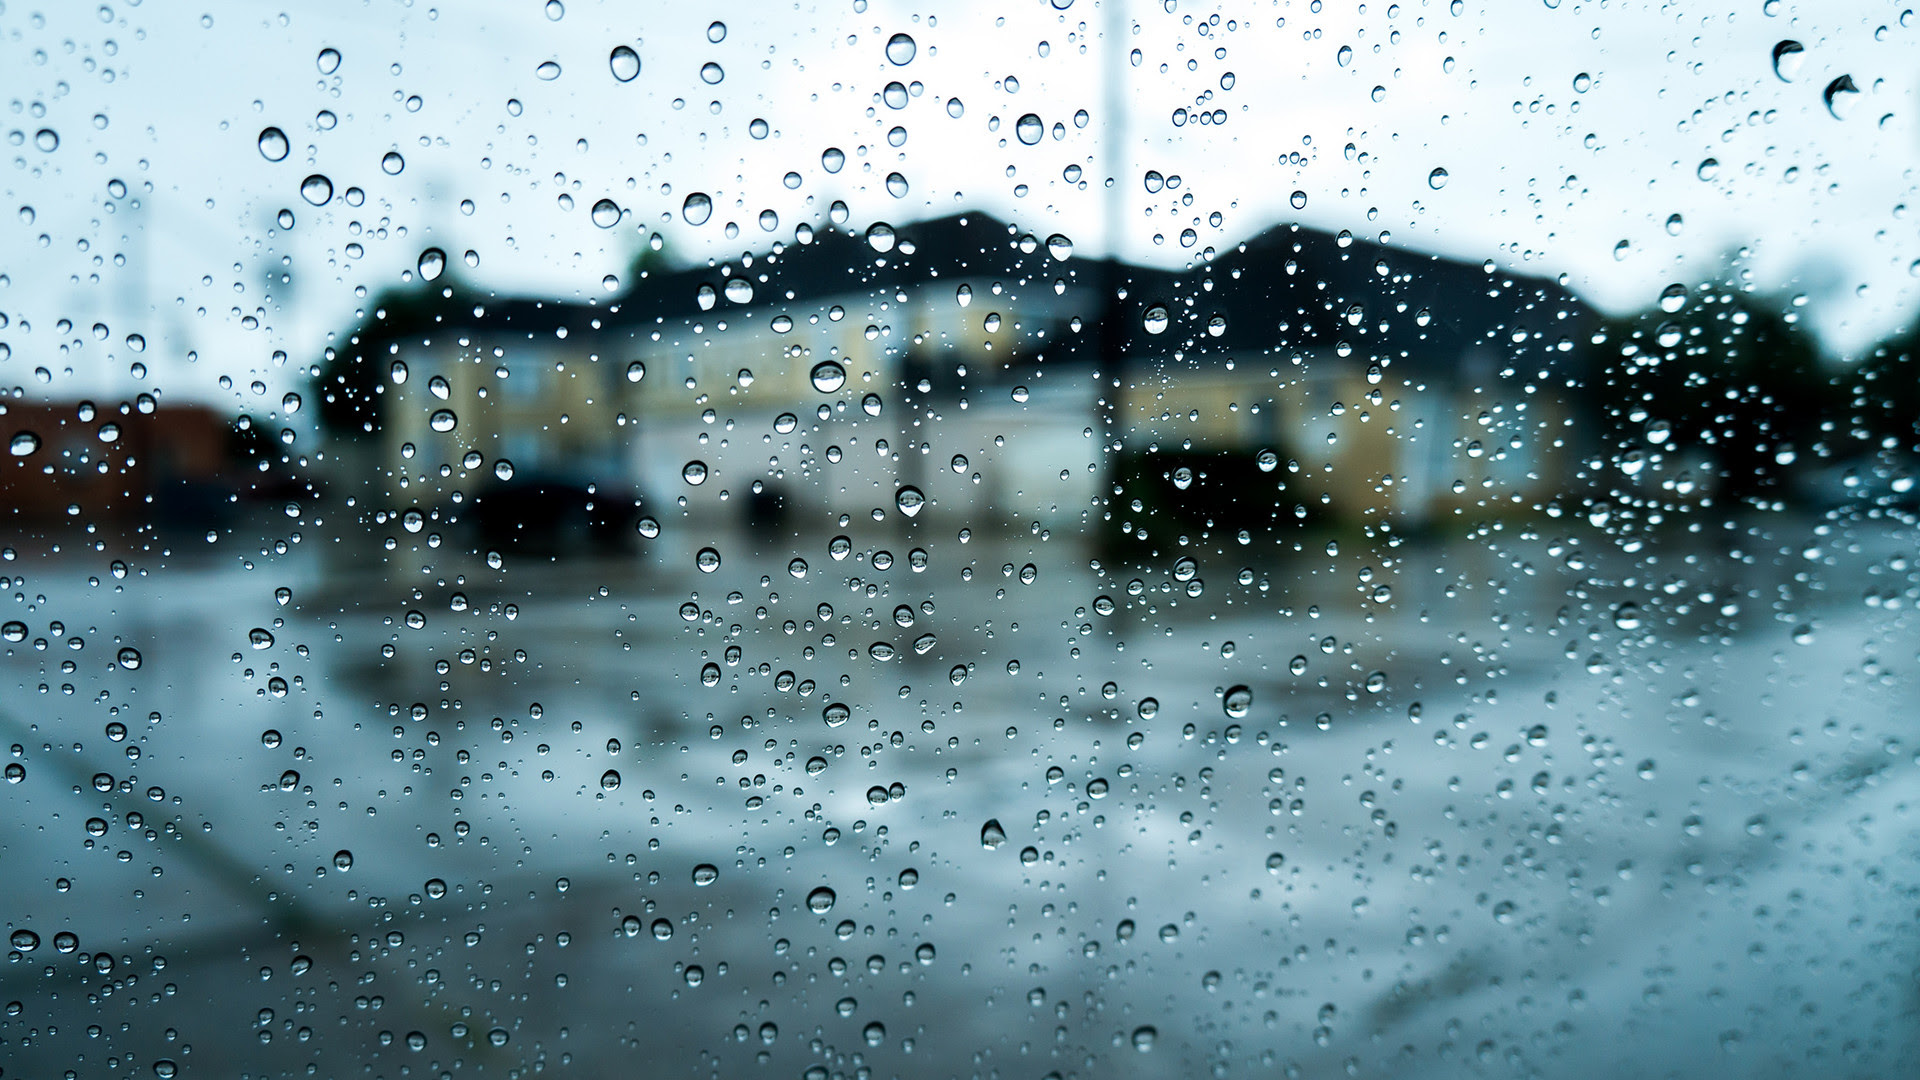 Rain HD Wallpaper (75+ images)